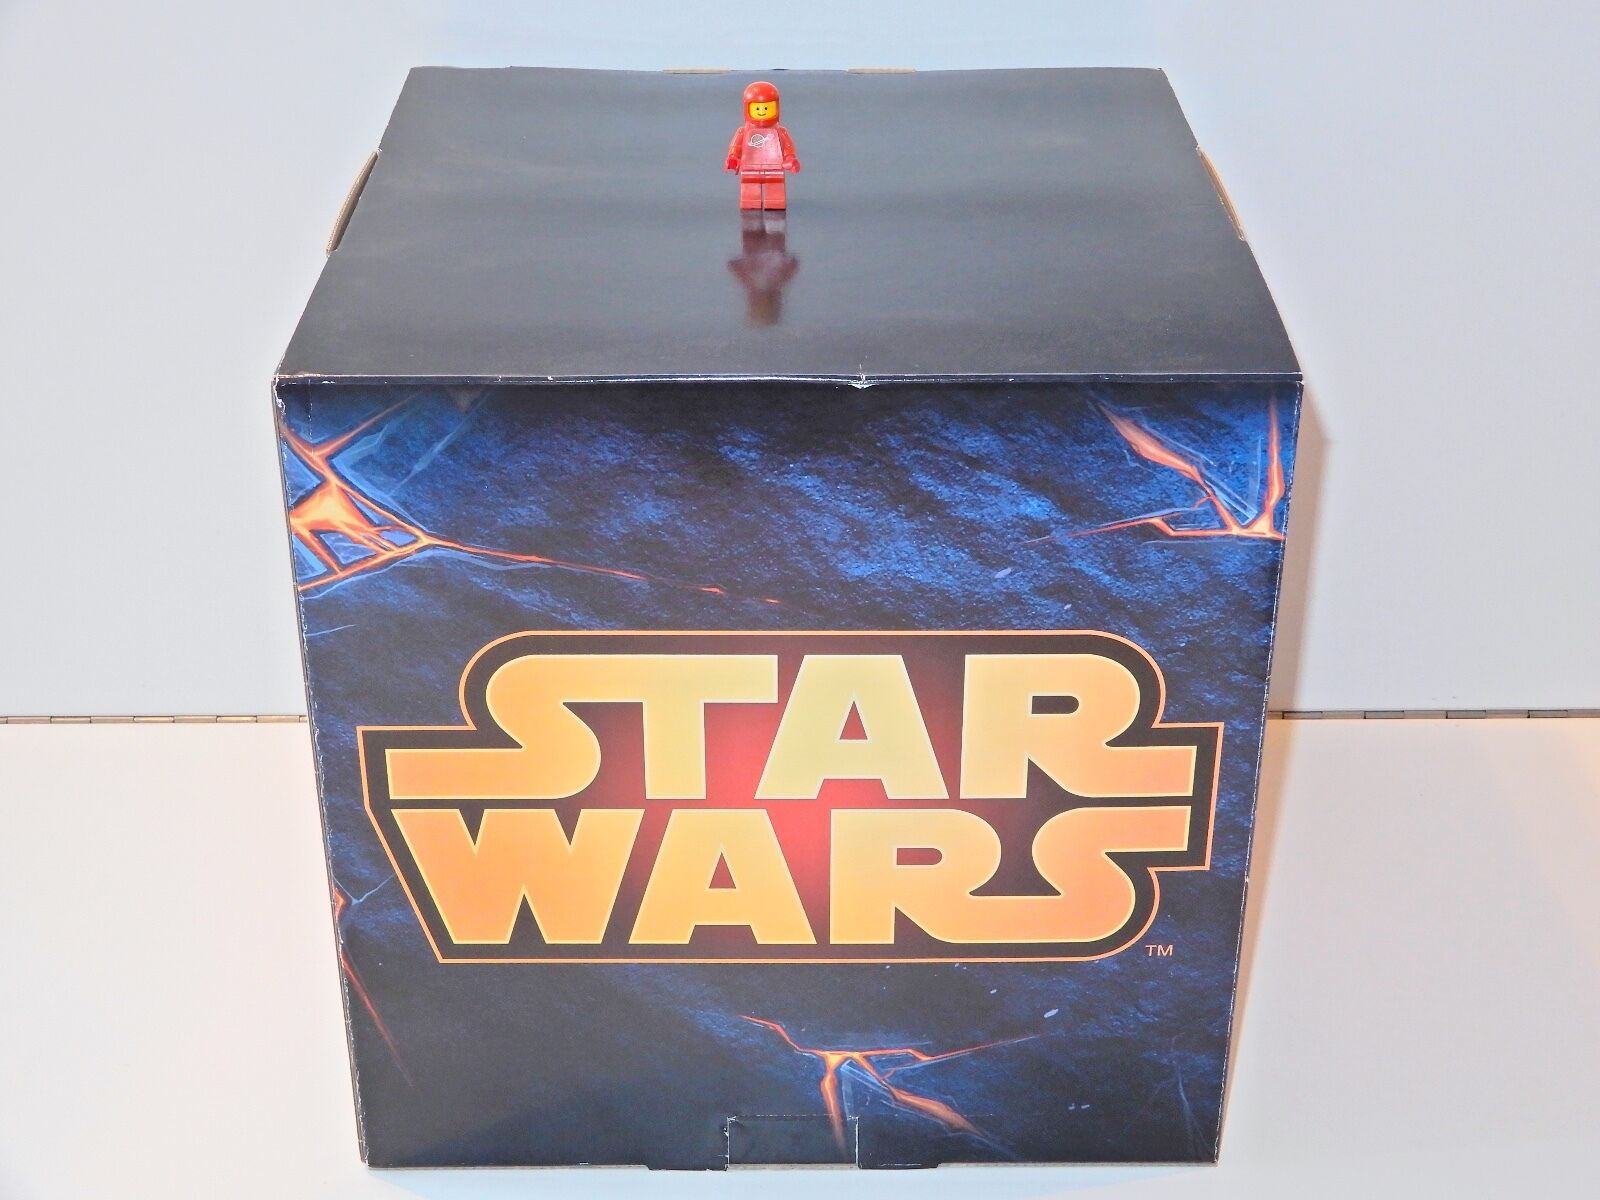 LEGO RETAIL STORE SHOP DISPLAY PLINTH CARDBOARD CUBE PEDESTAL 'STAR WARS'